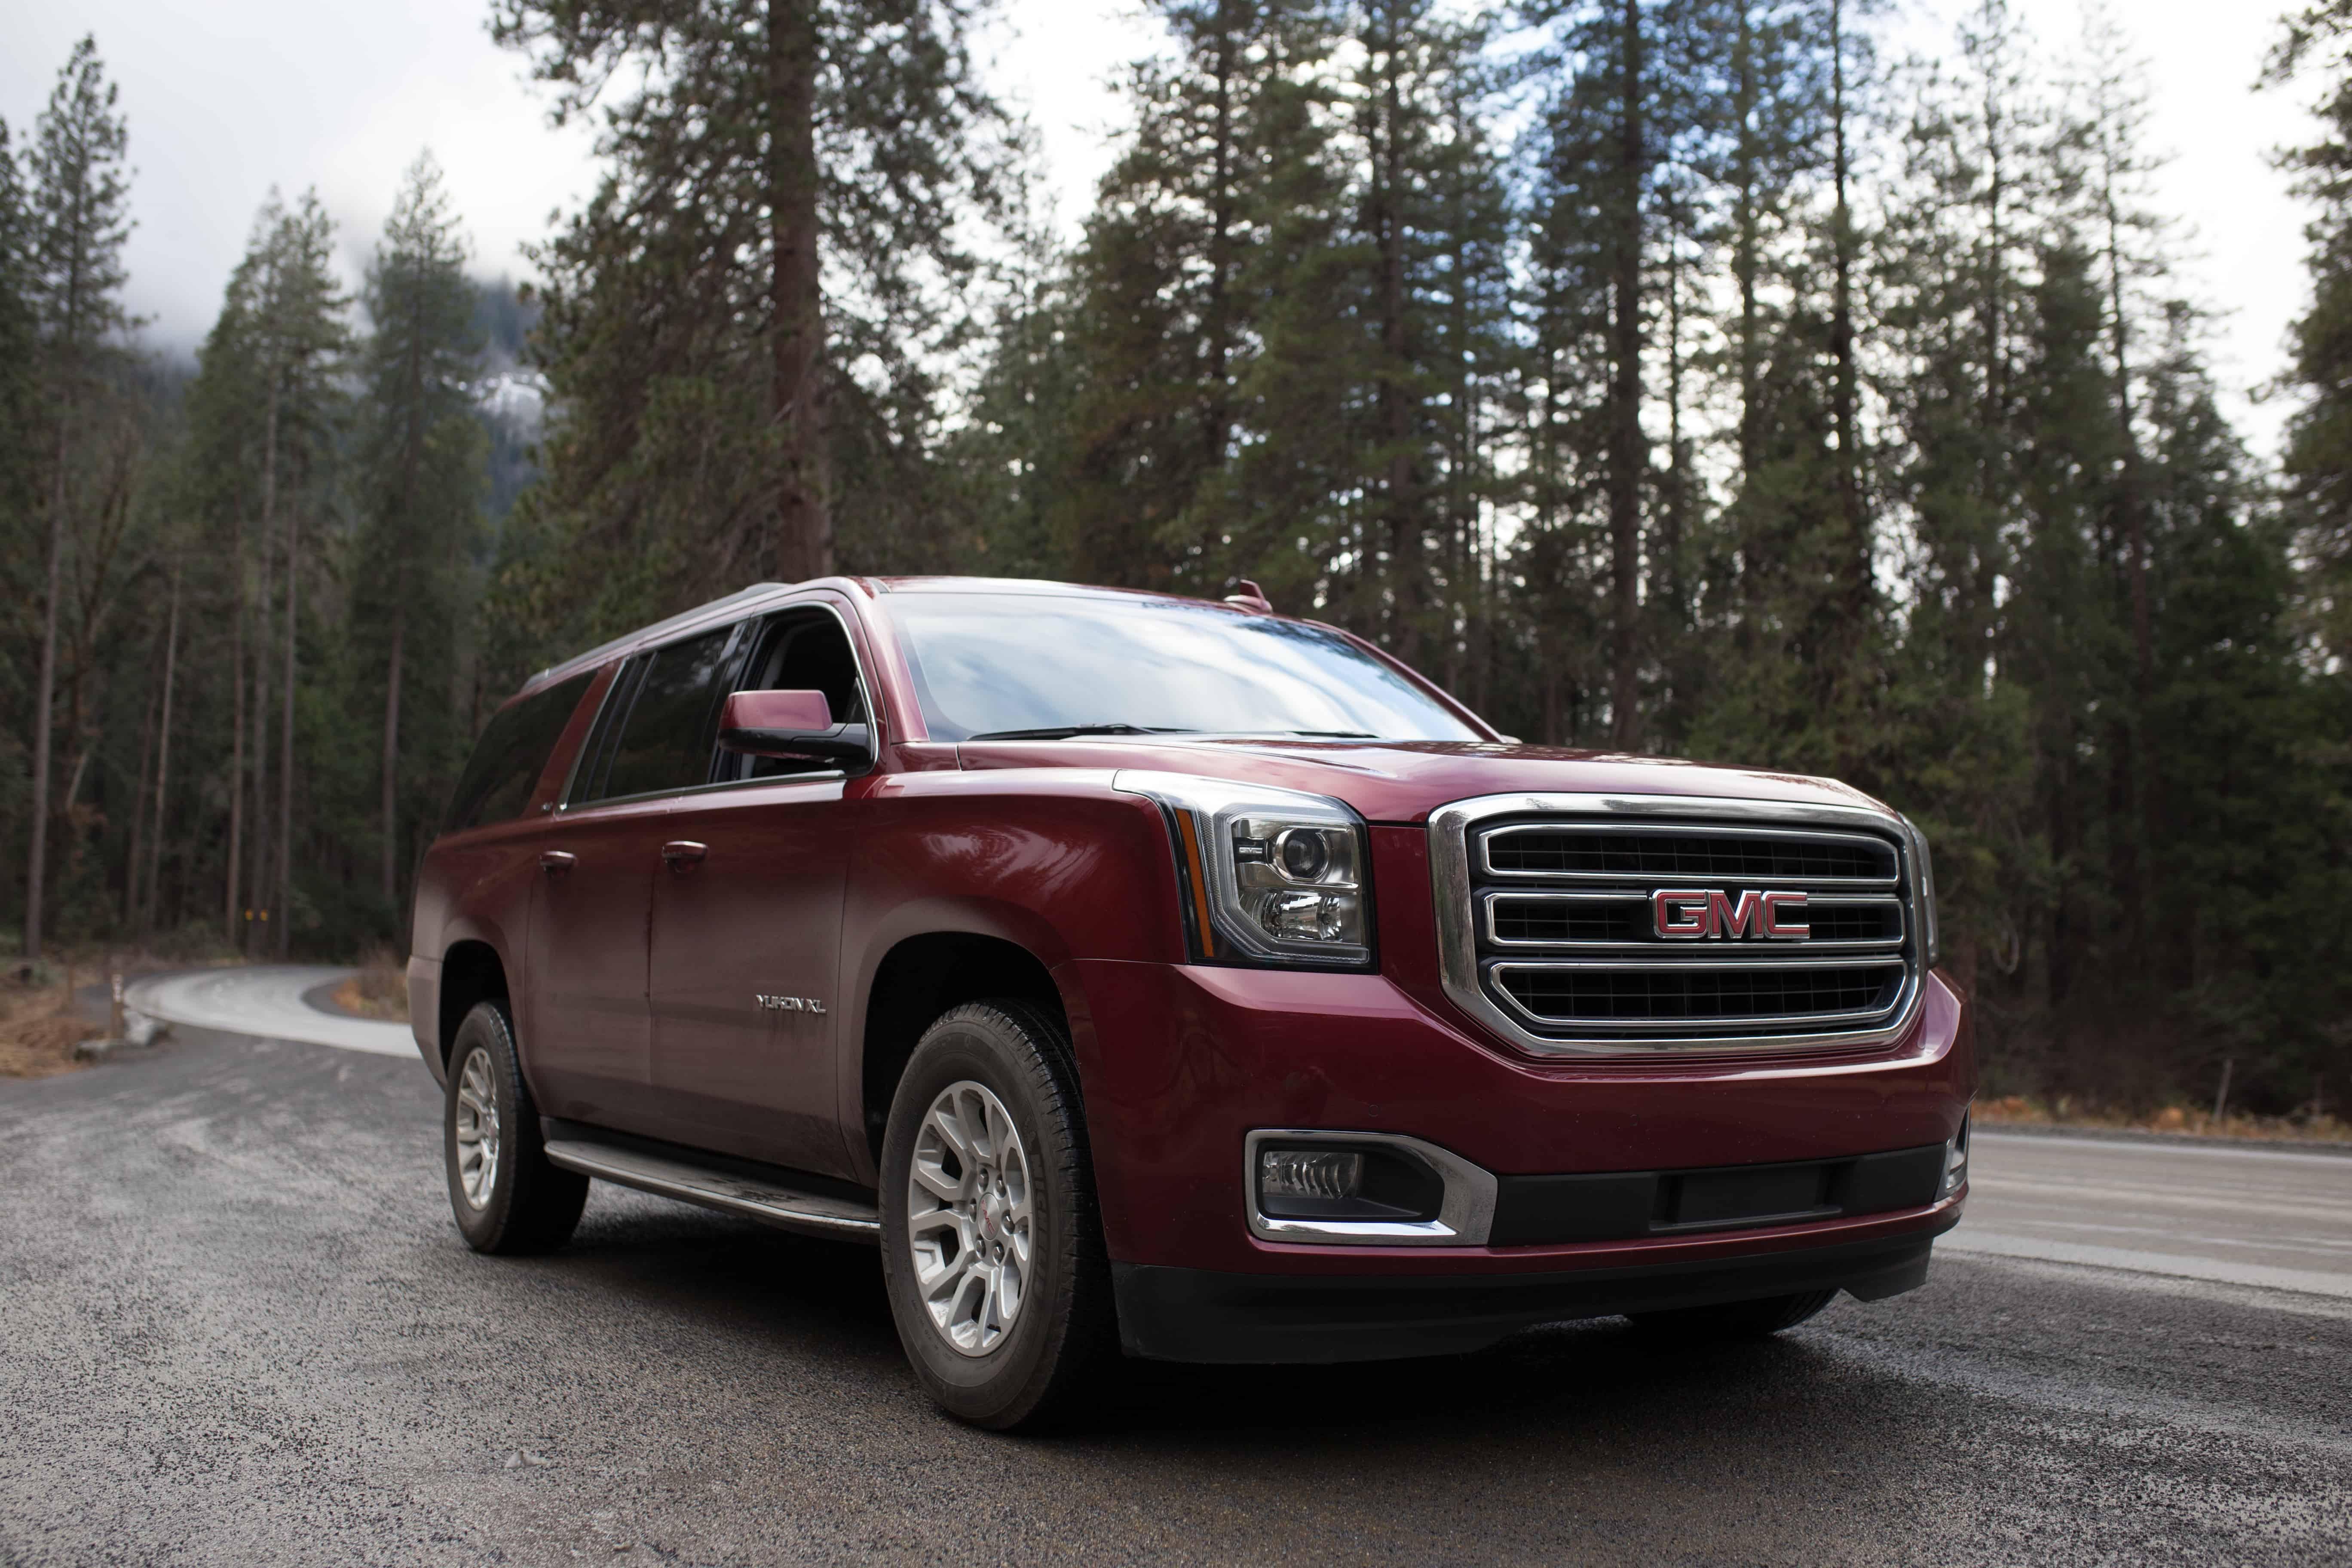 General Motors Recalls Various Vehicles Due to Vacuum Pump